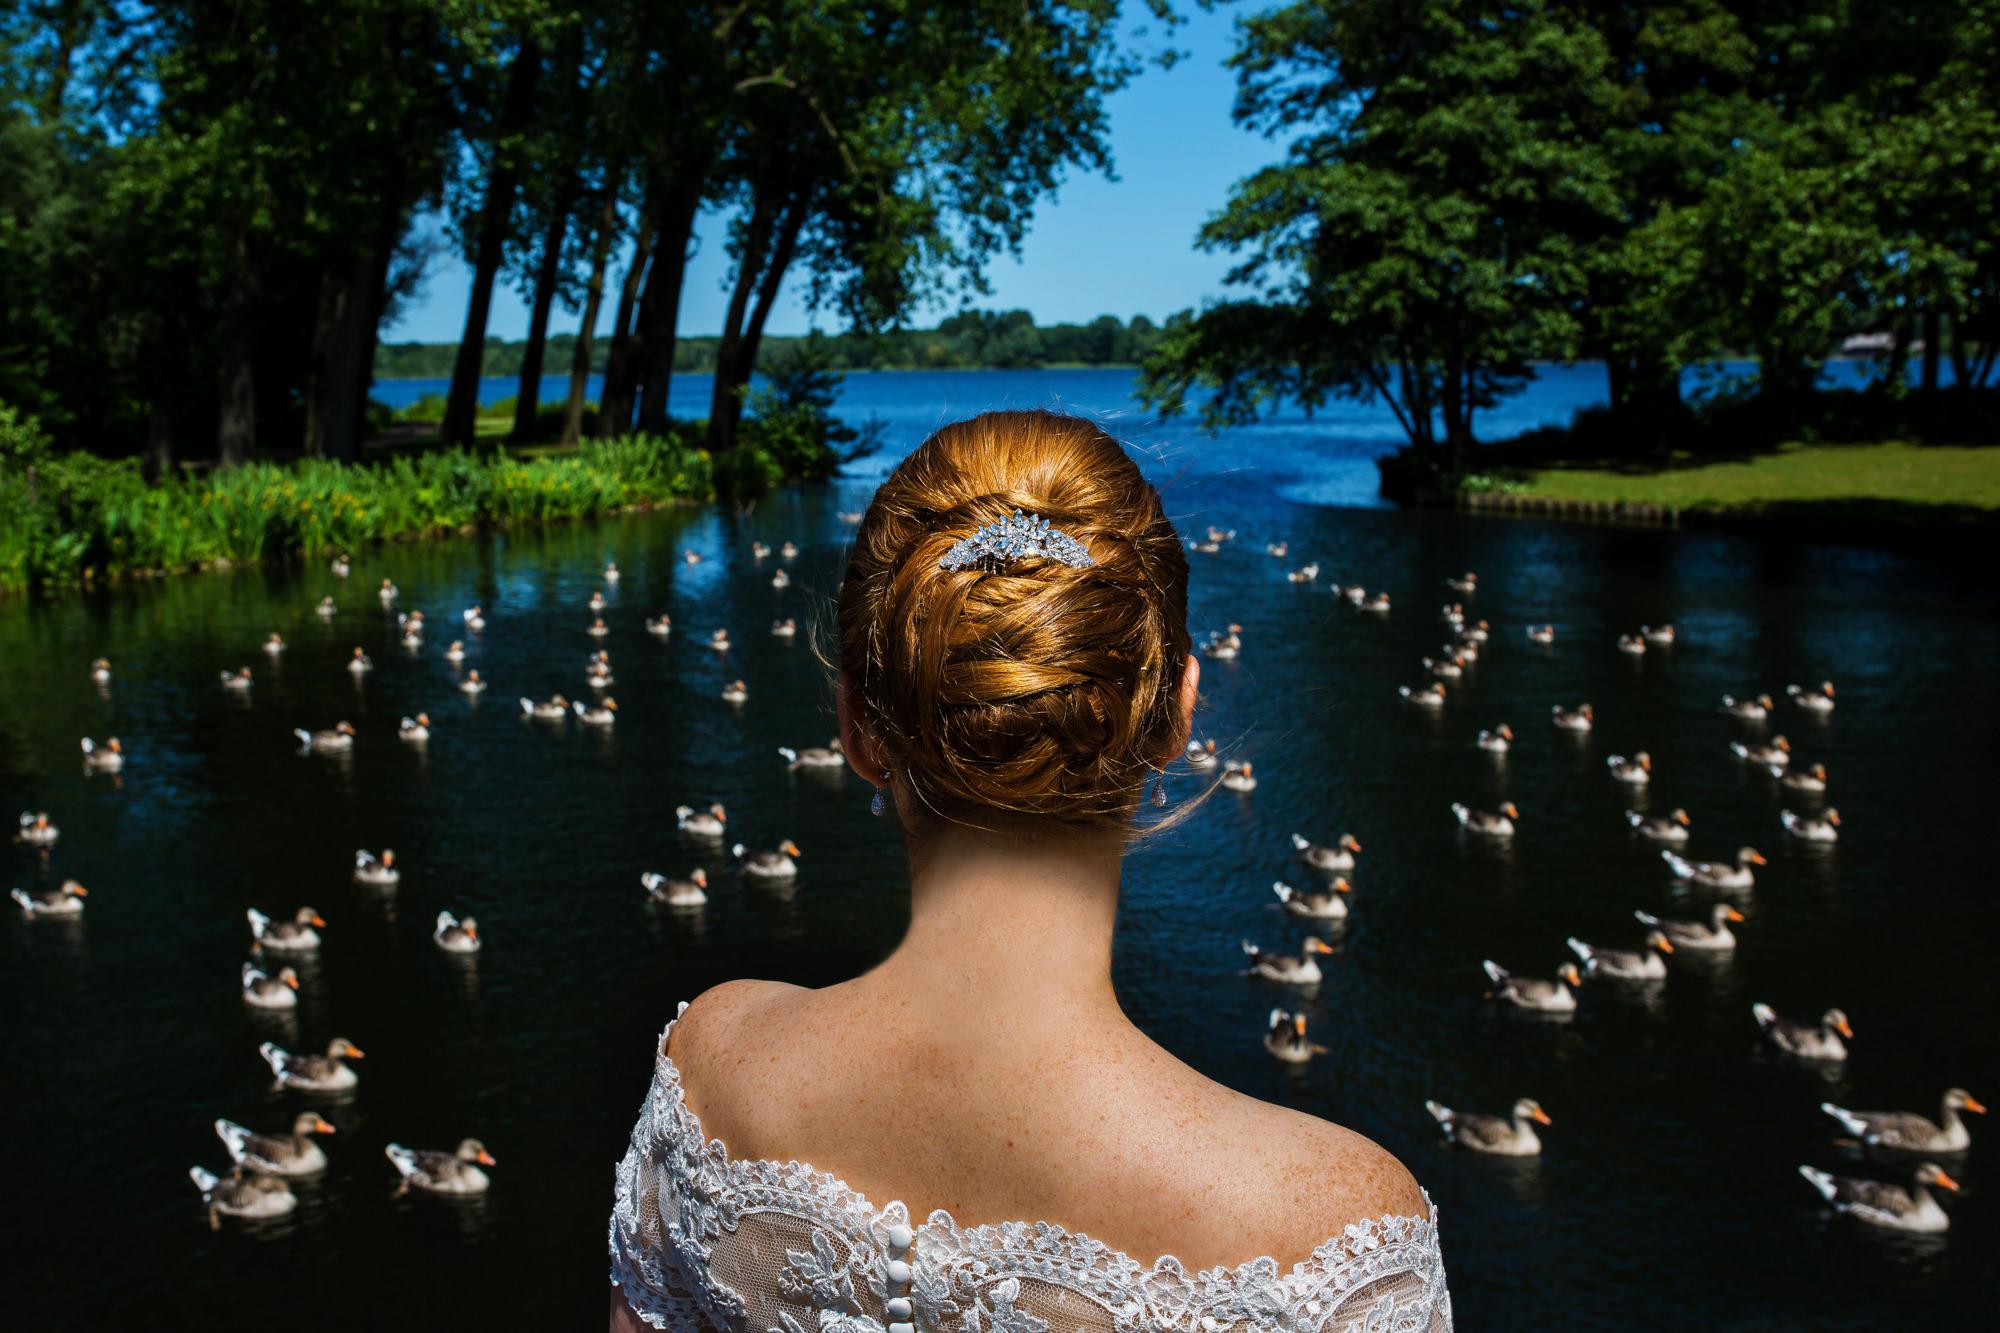 Back of bride with updo and off-shoulder dress photo by Fotobelle: Isabelle Hattink